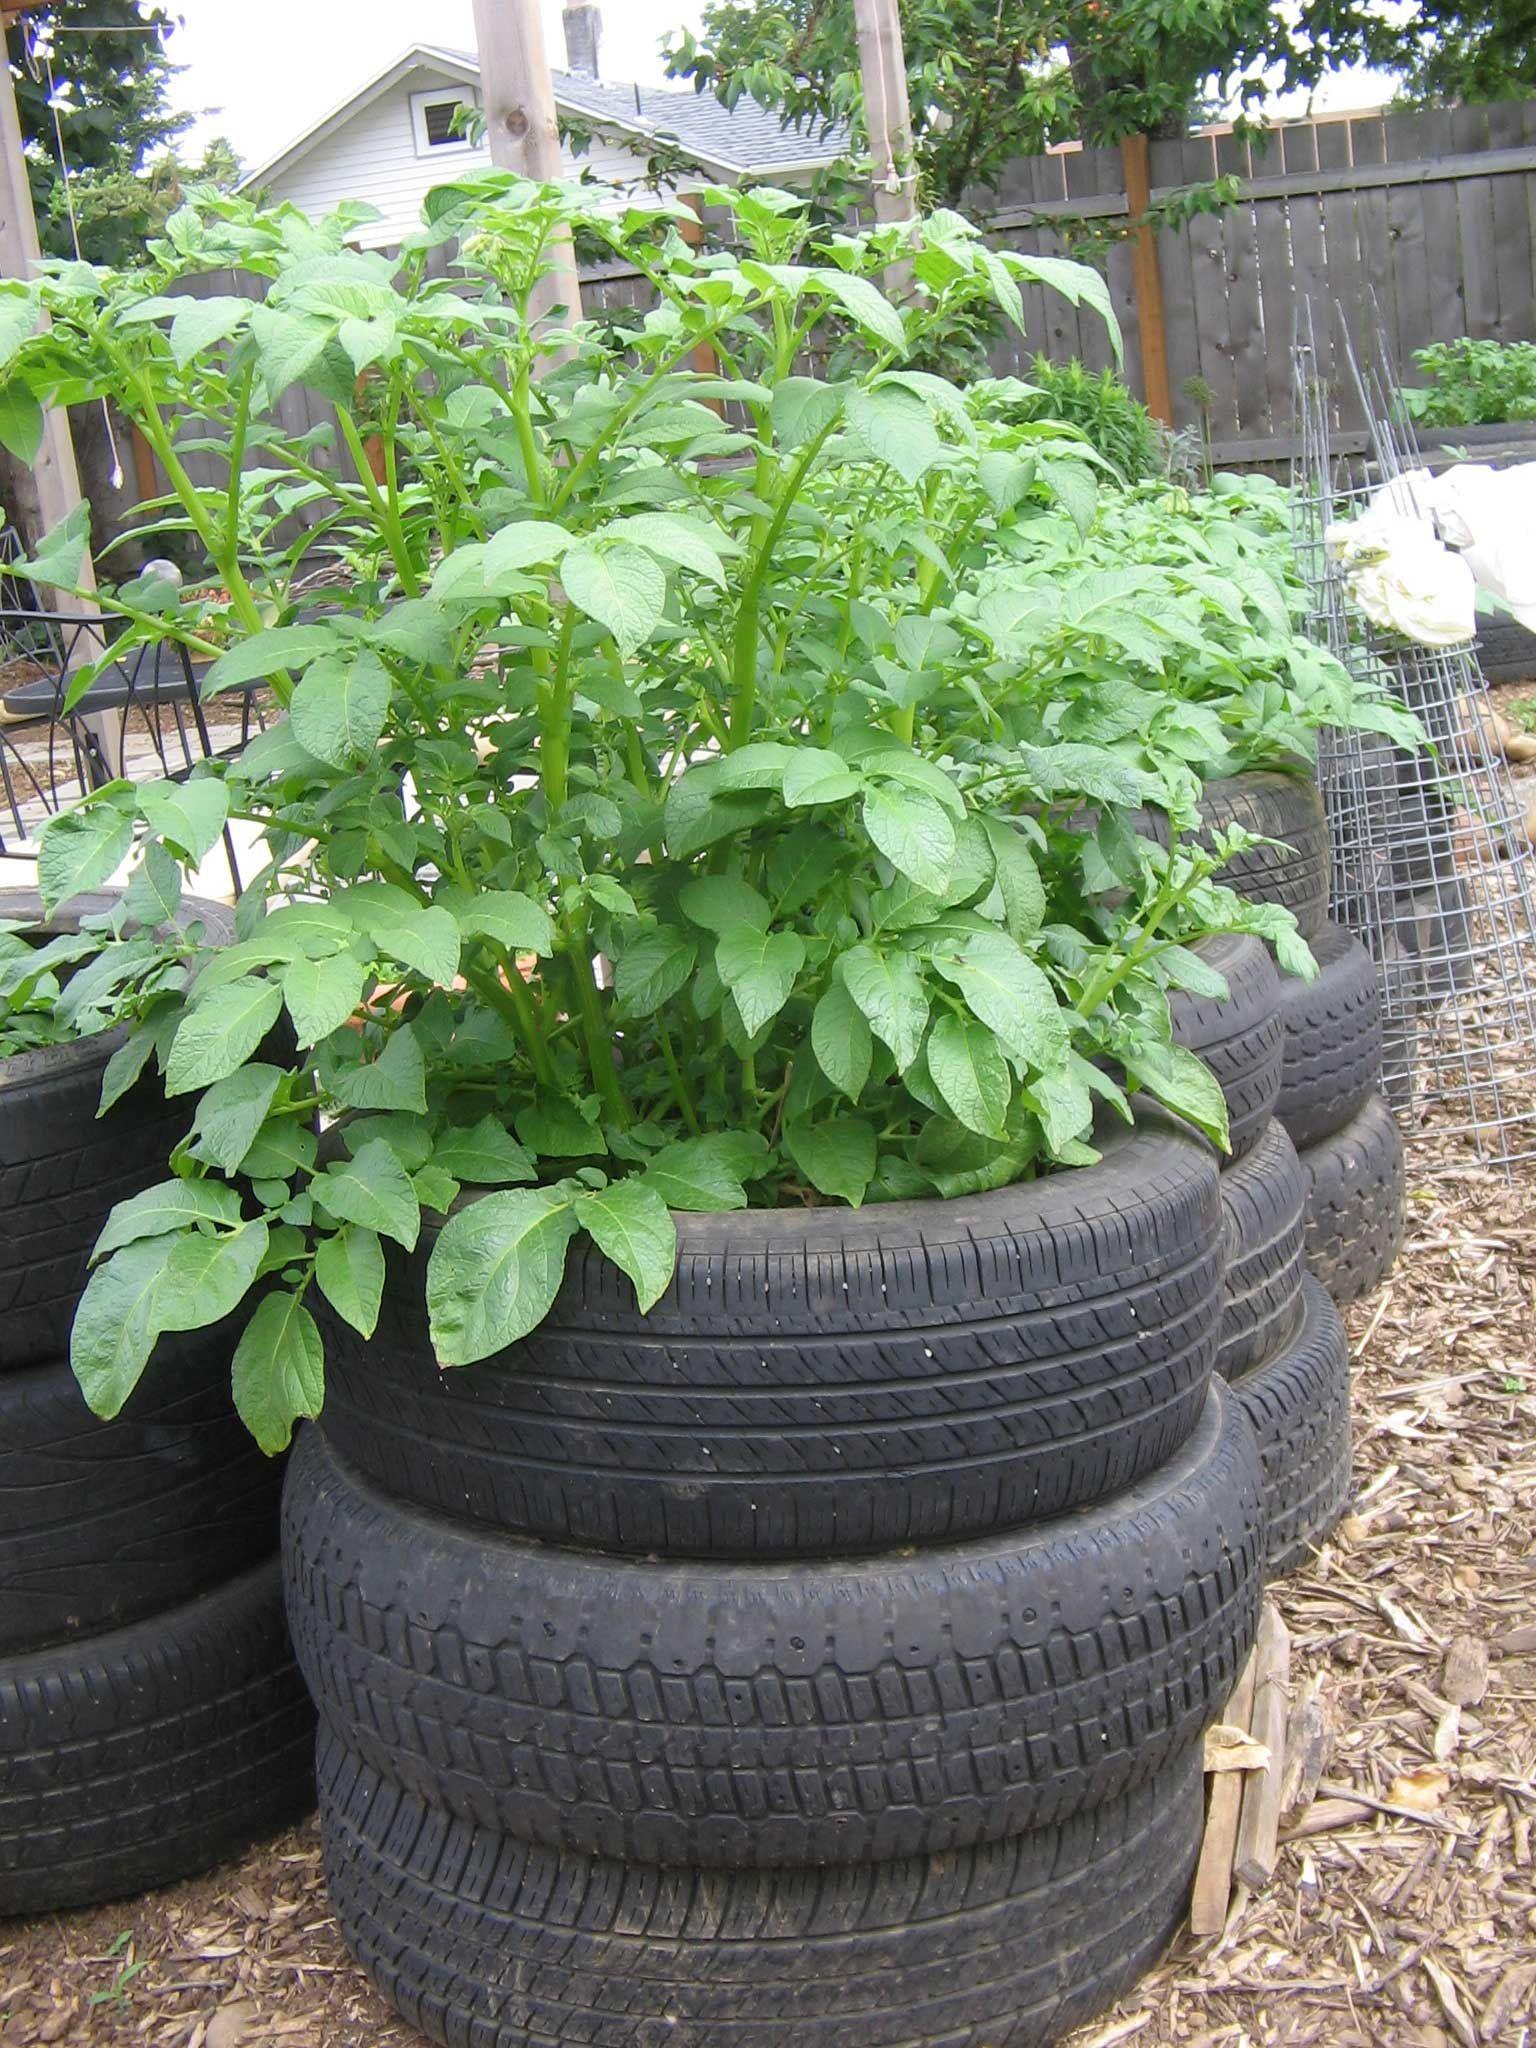 Prolific Potato Tires Vege Garden Ideas Growing